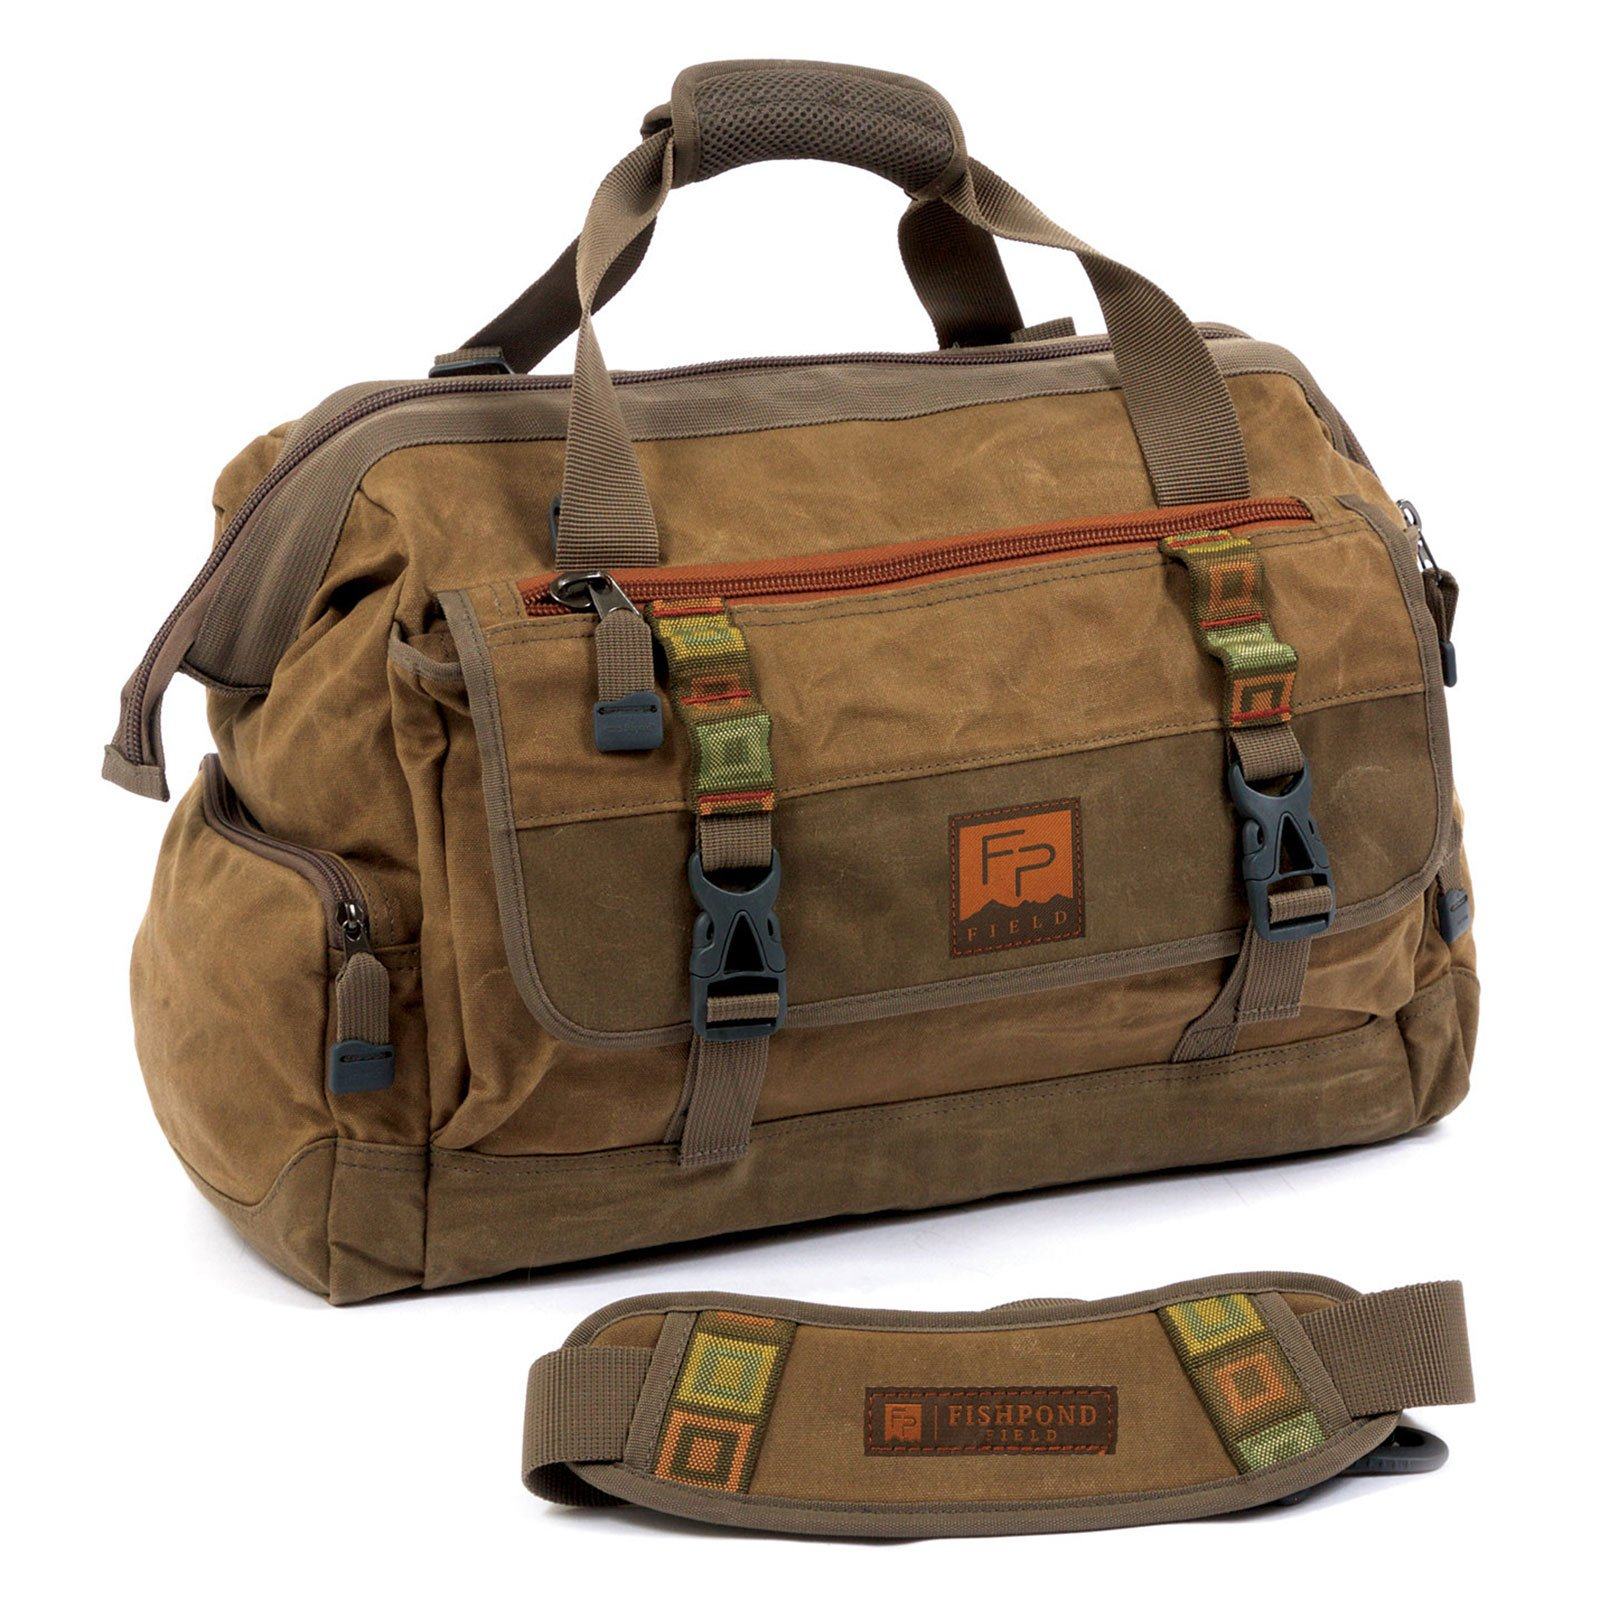 Fishpond Bighorn Kit Bag - Earth